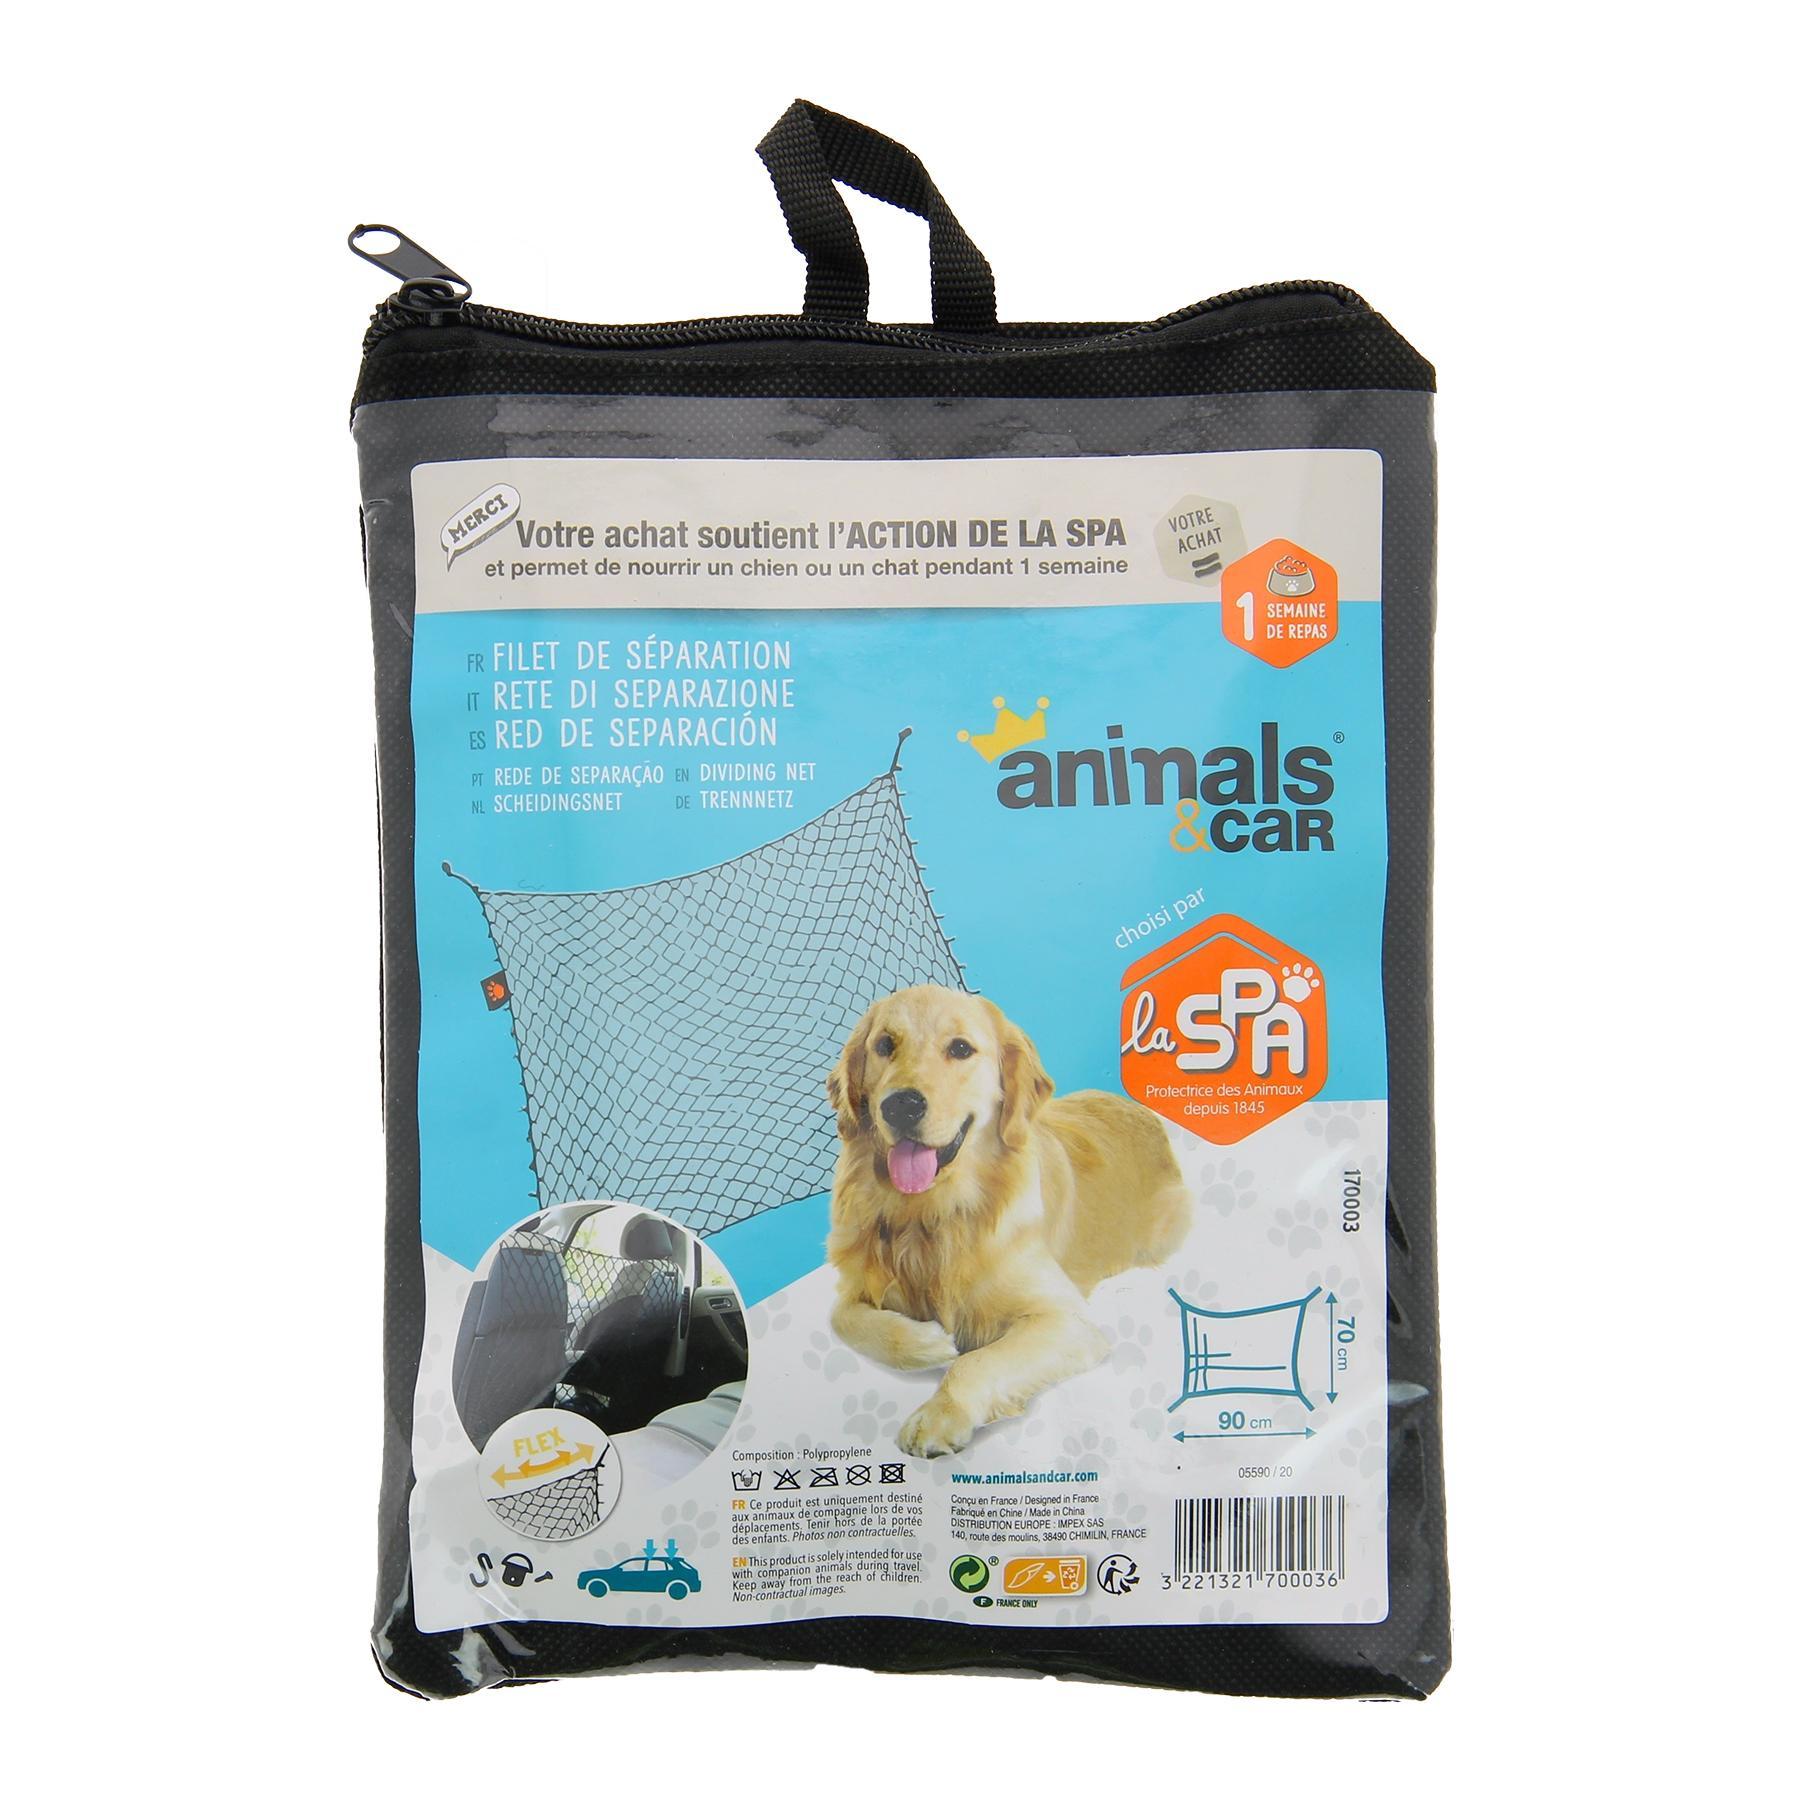 Dog car net barrier animals&car 170003 expert knowledge